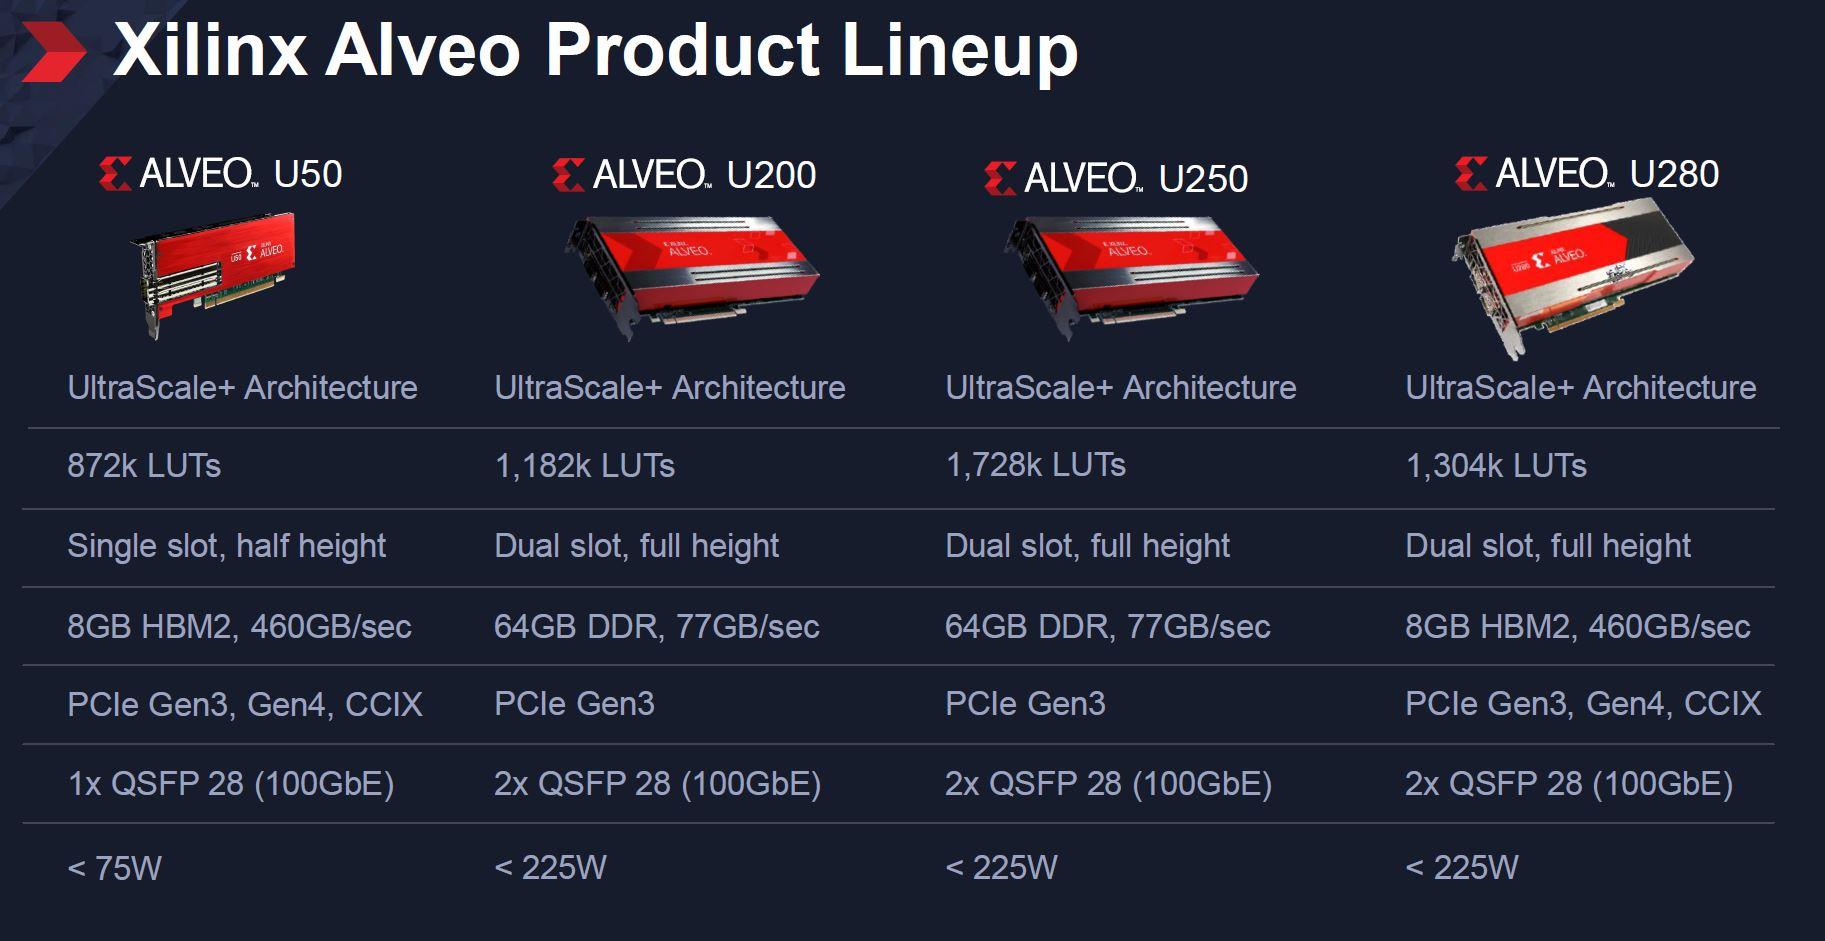 Xilinx Alveo Lineup August 2019